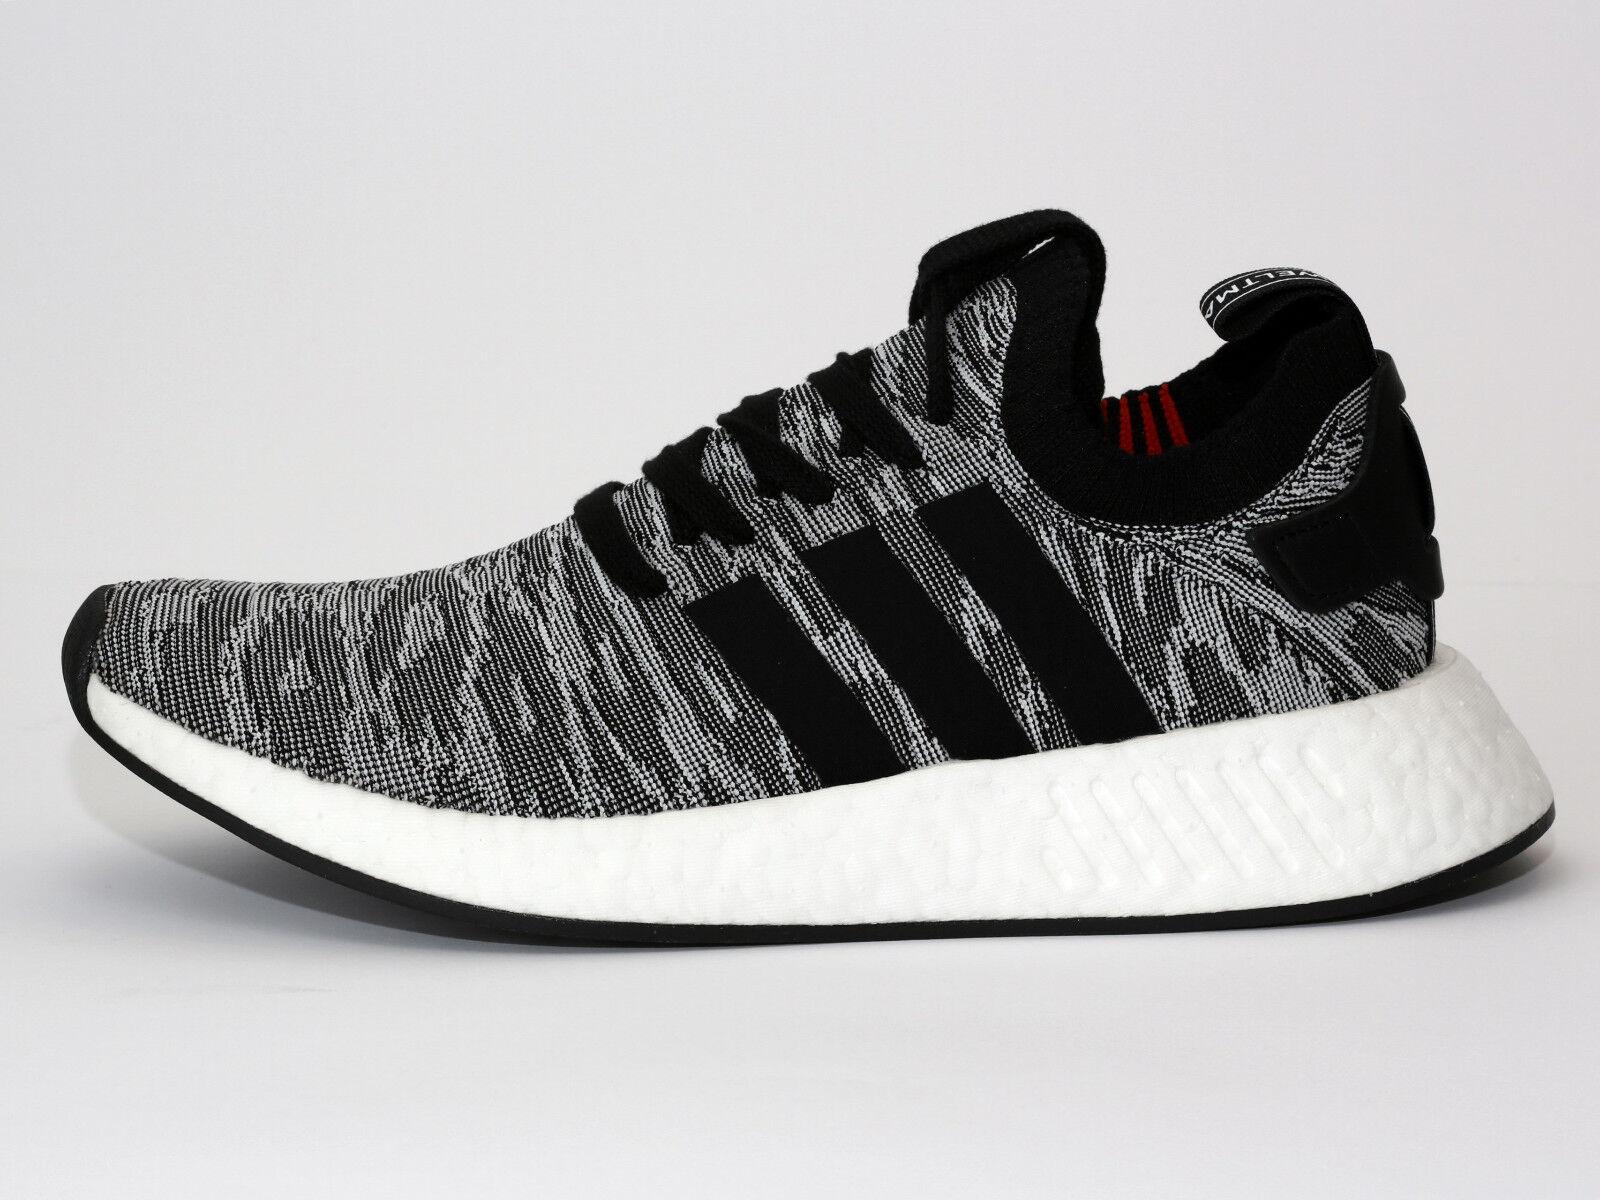 Adidas Originals NMD_R2 PK (BY9409) Sneaker - Schwarz/Grau - Neu (ss)